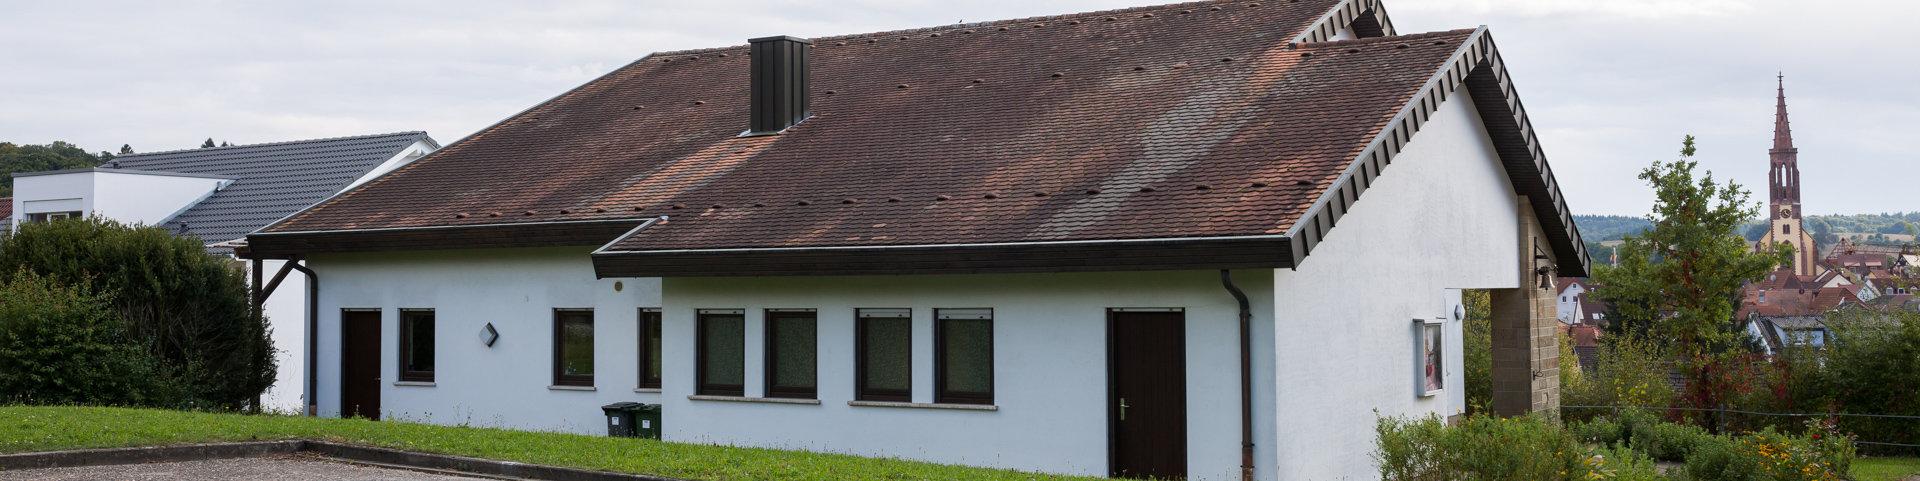 Gemeindehaus mieten / Quelle: Felix Junker